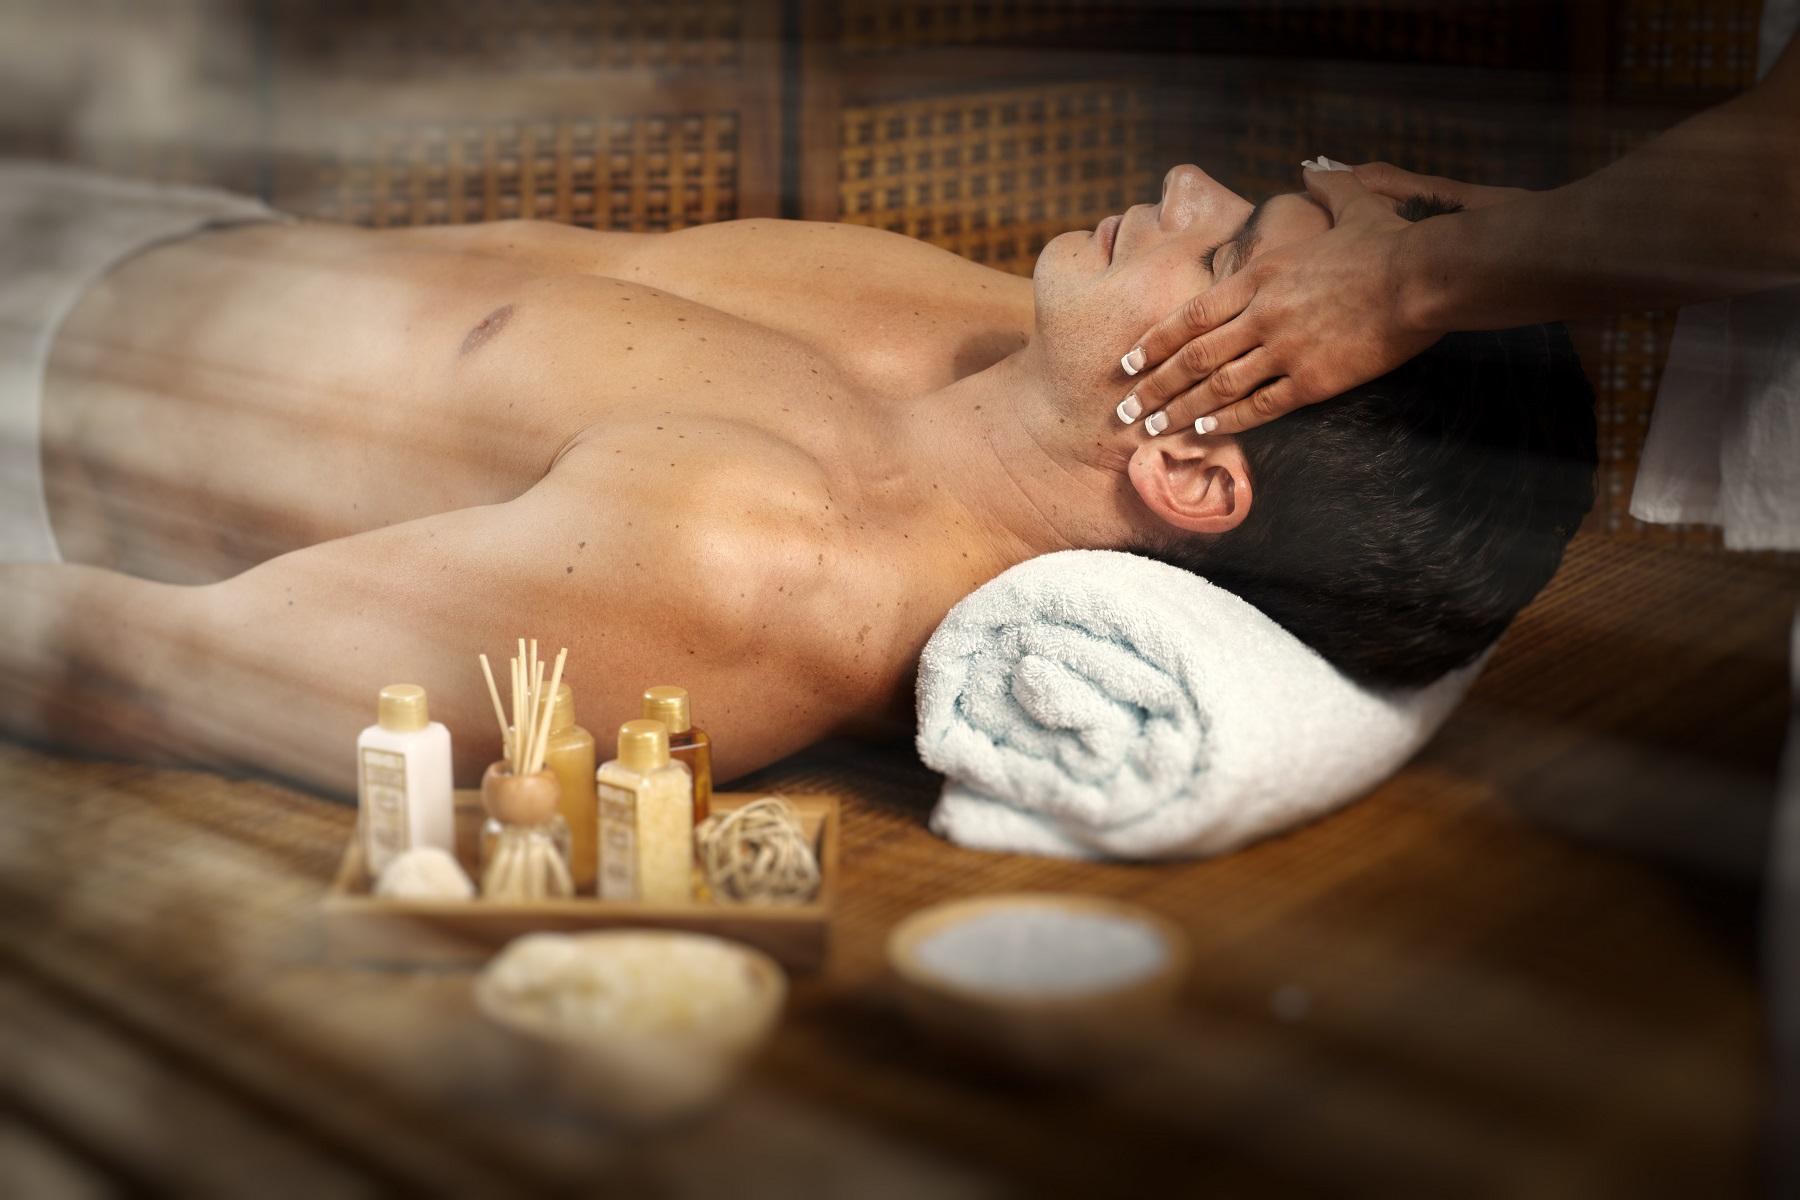 sensual tantra massage in Singapore